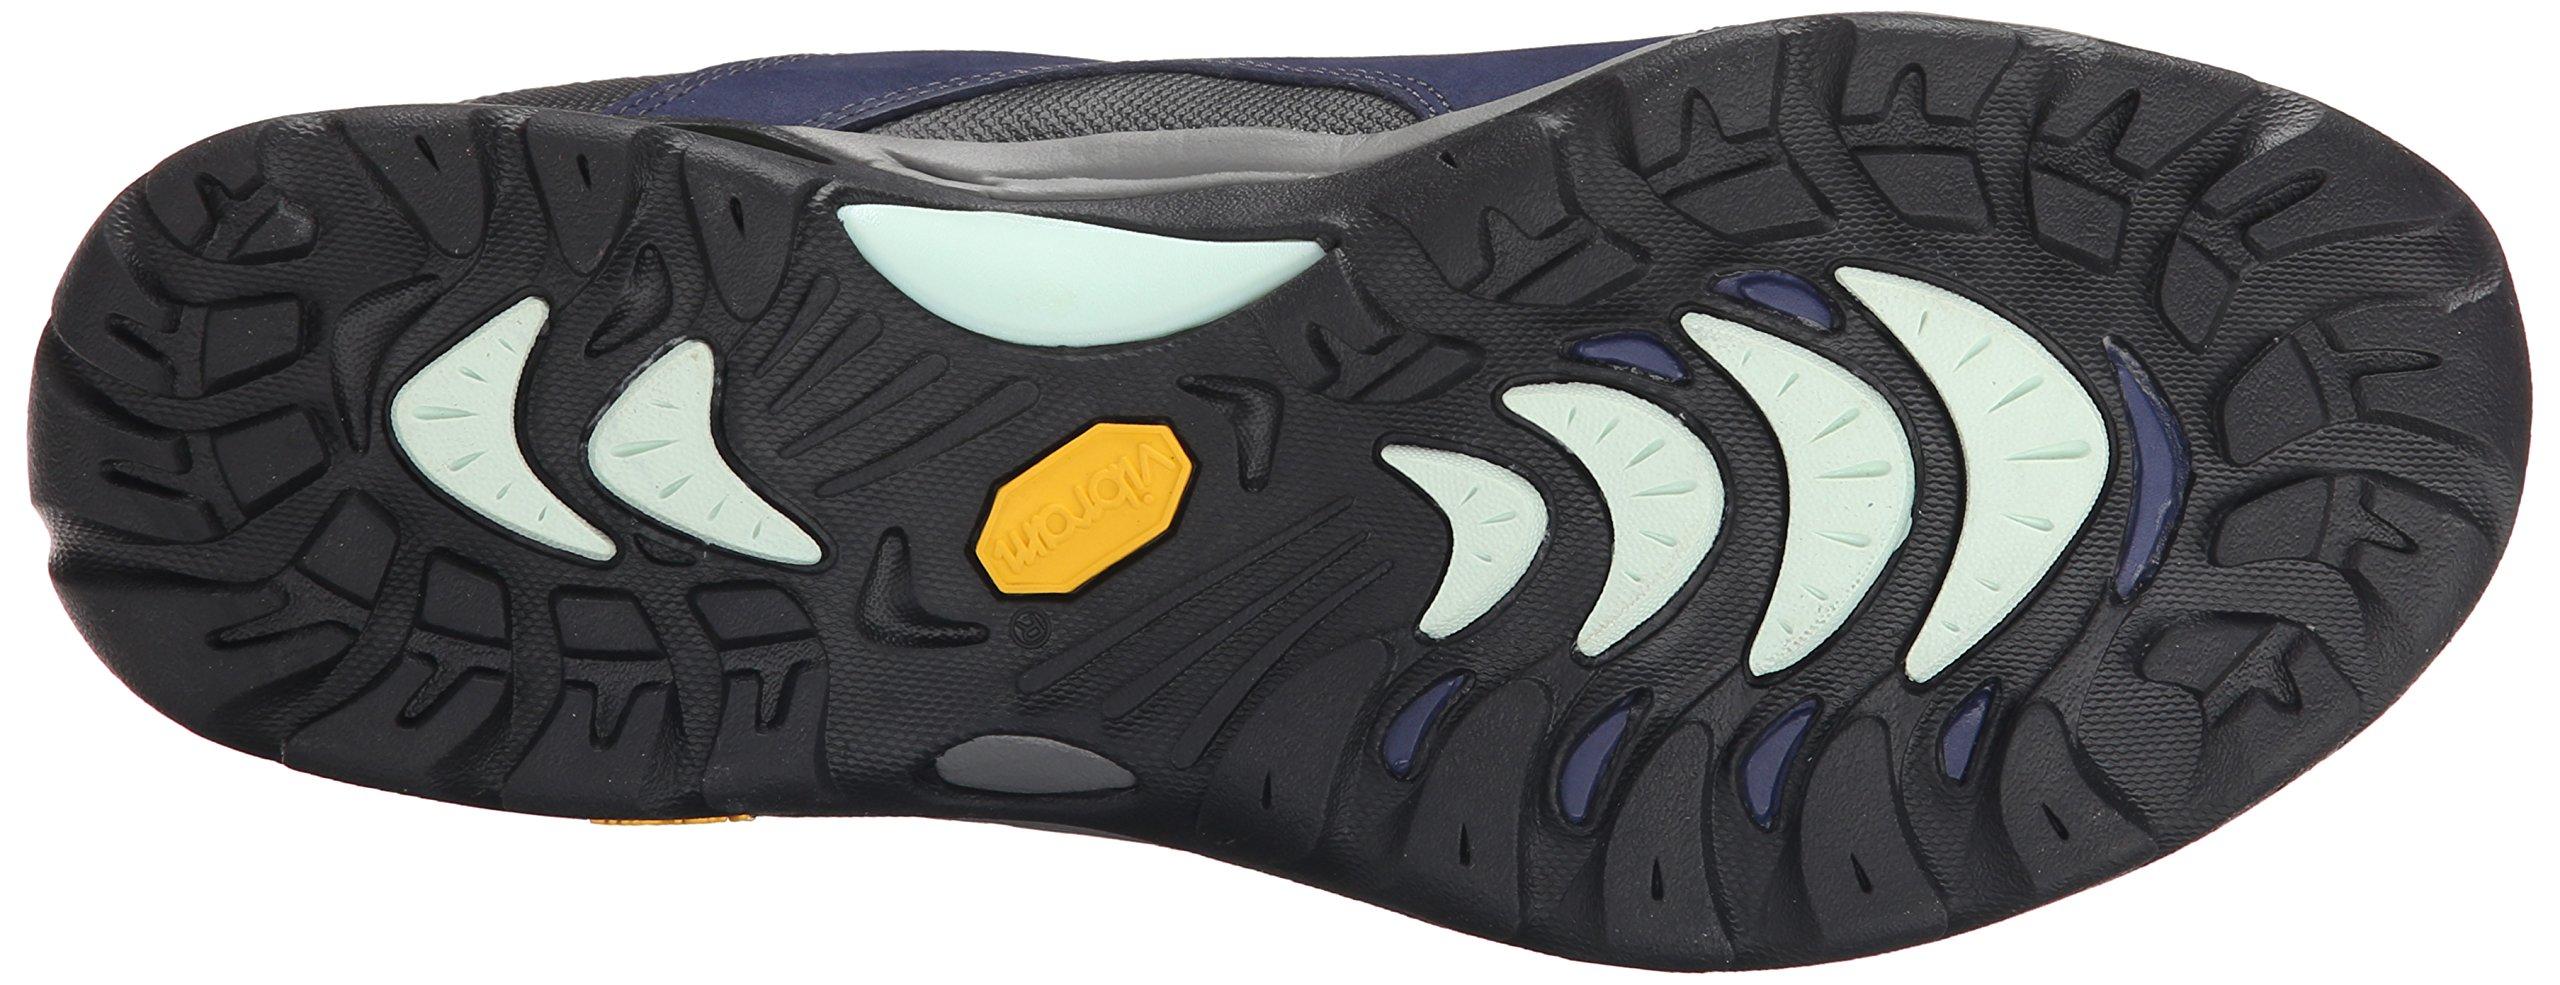 Ahnu Women's Montara Waterproof Boot,Midnight Blue,8 M US by Ahnu (Image #3)